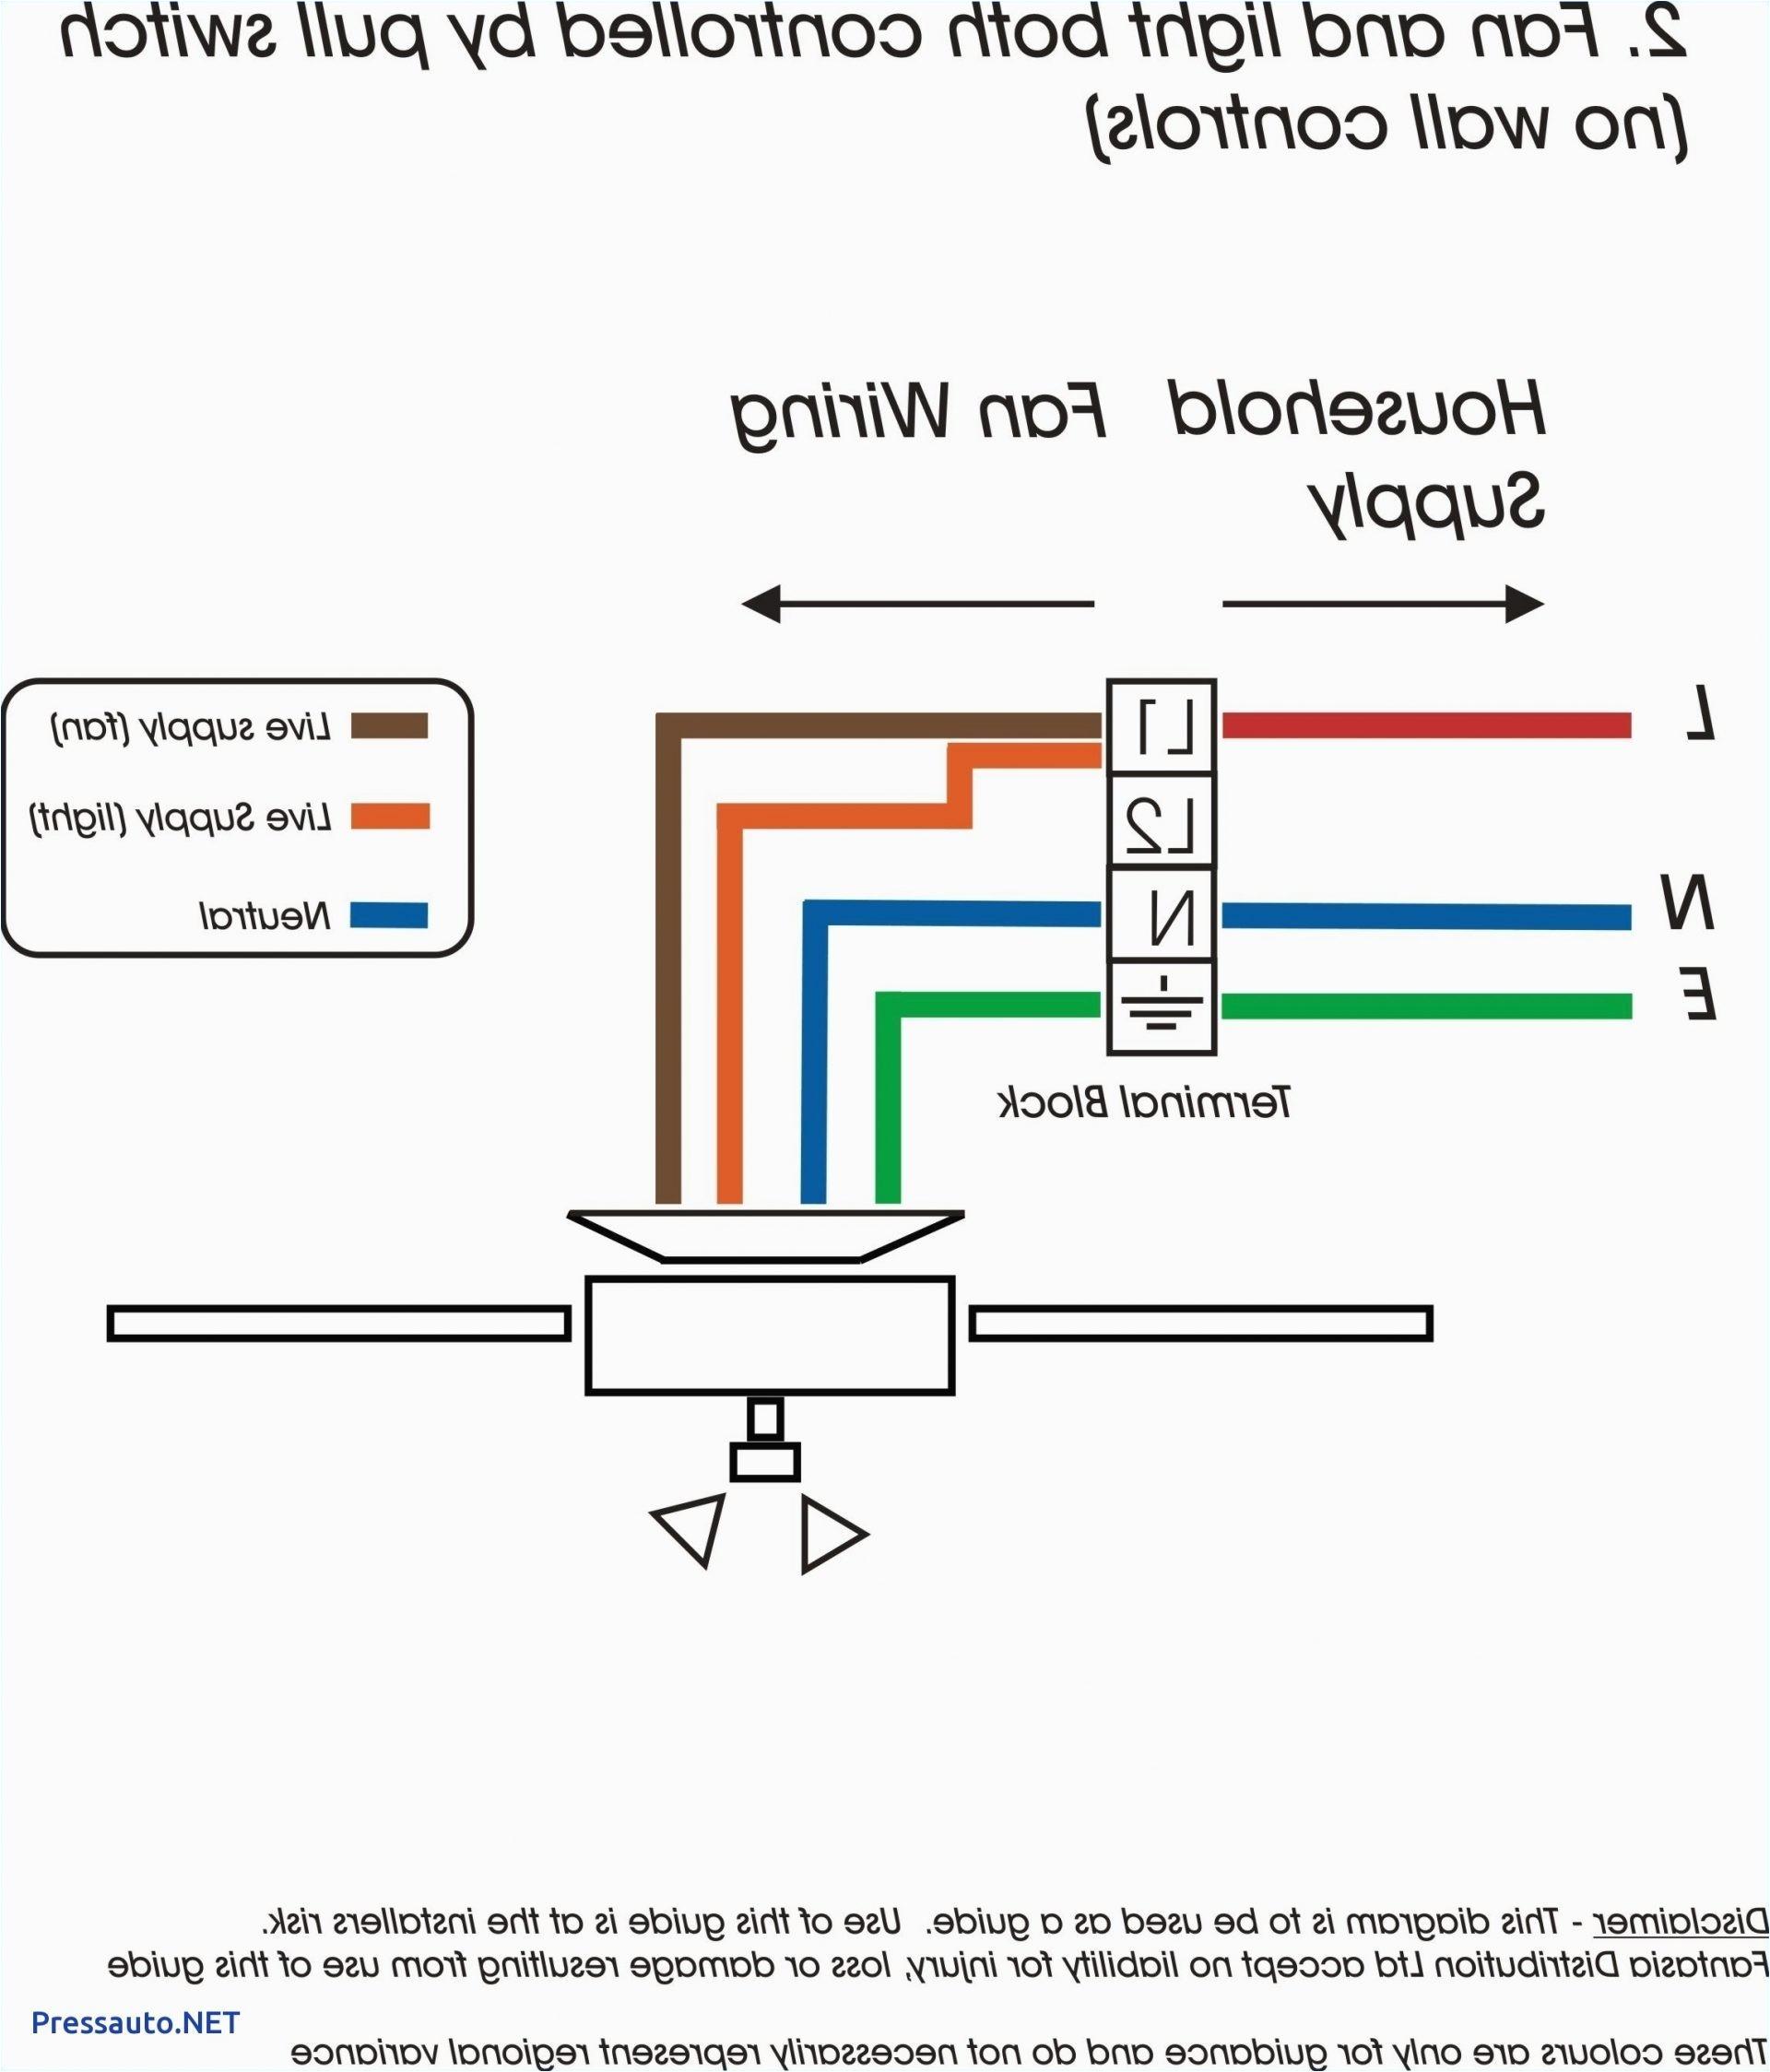 pa600 electric hoist wiring diagram wiring diagram user pa600 electric hoist wiring diagram